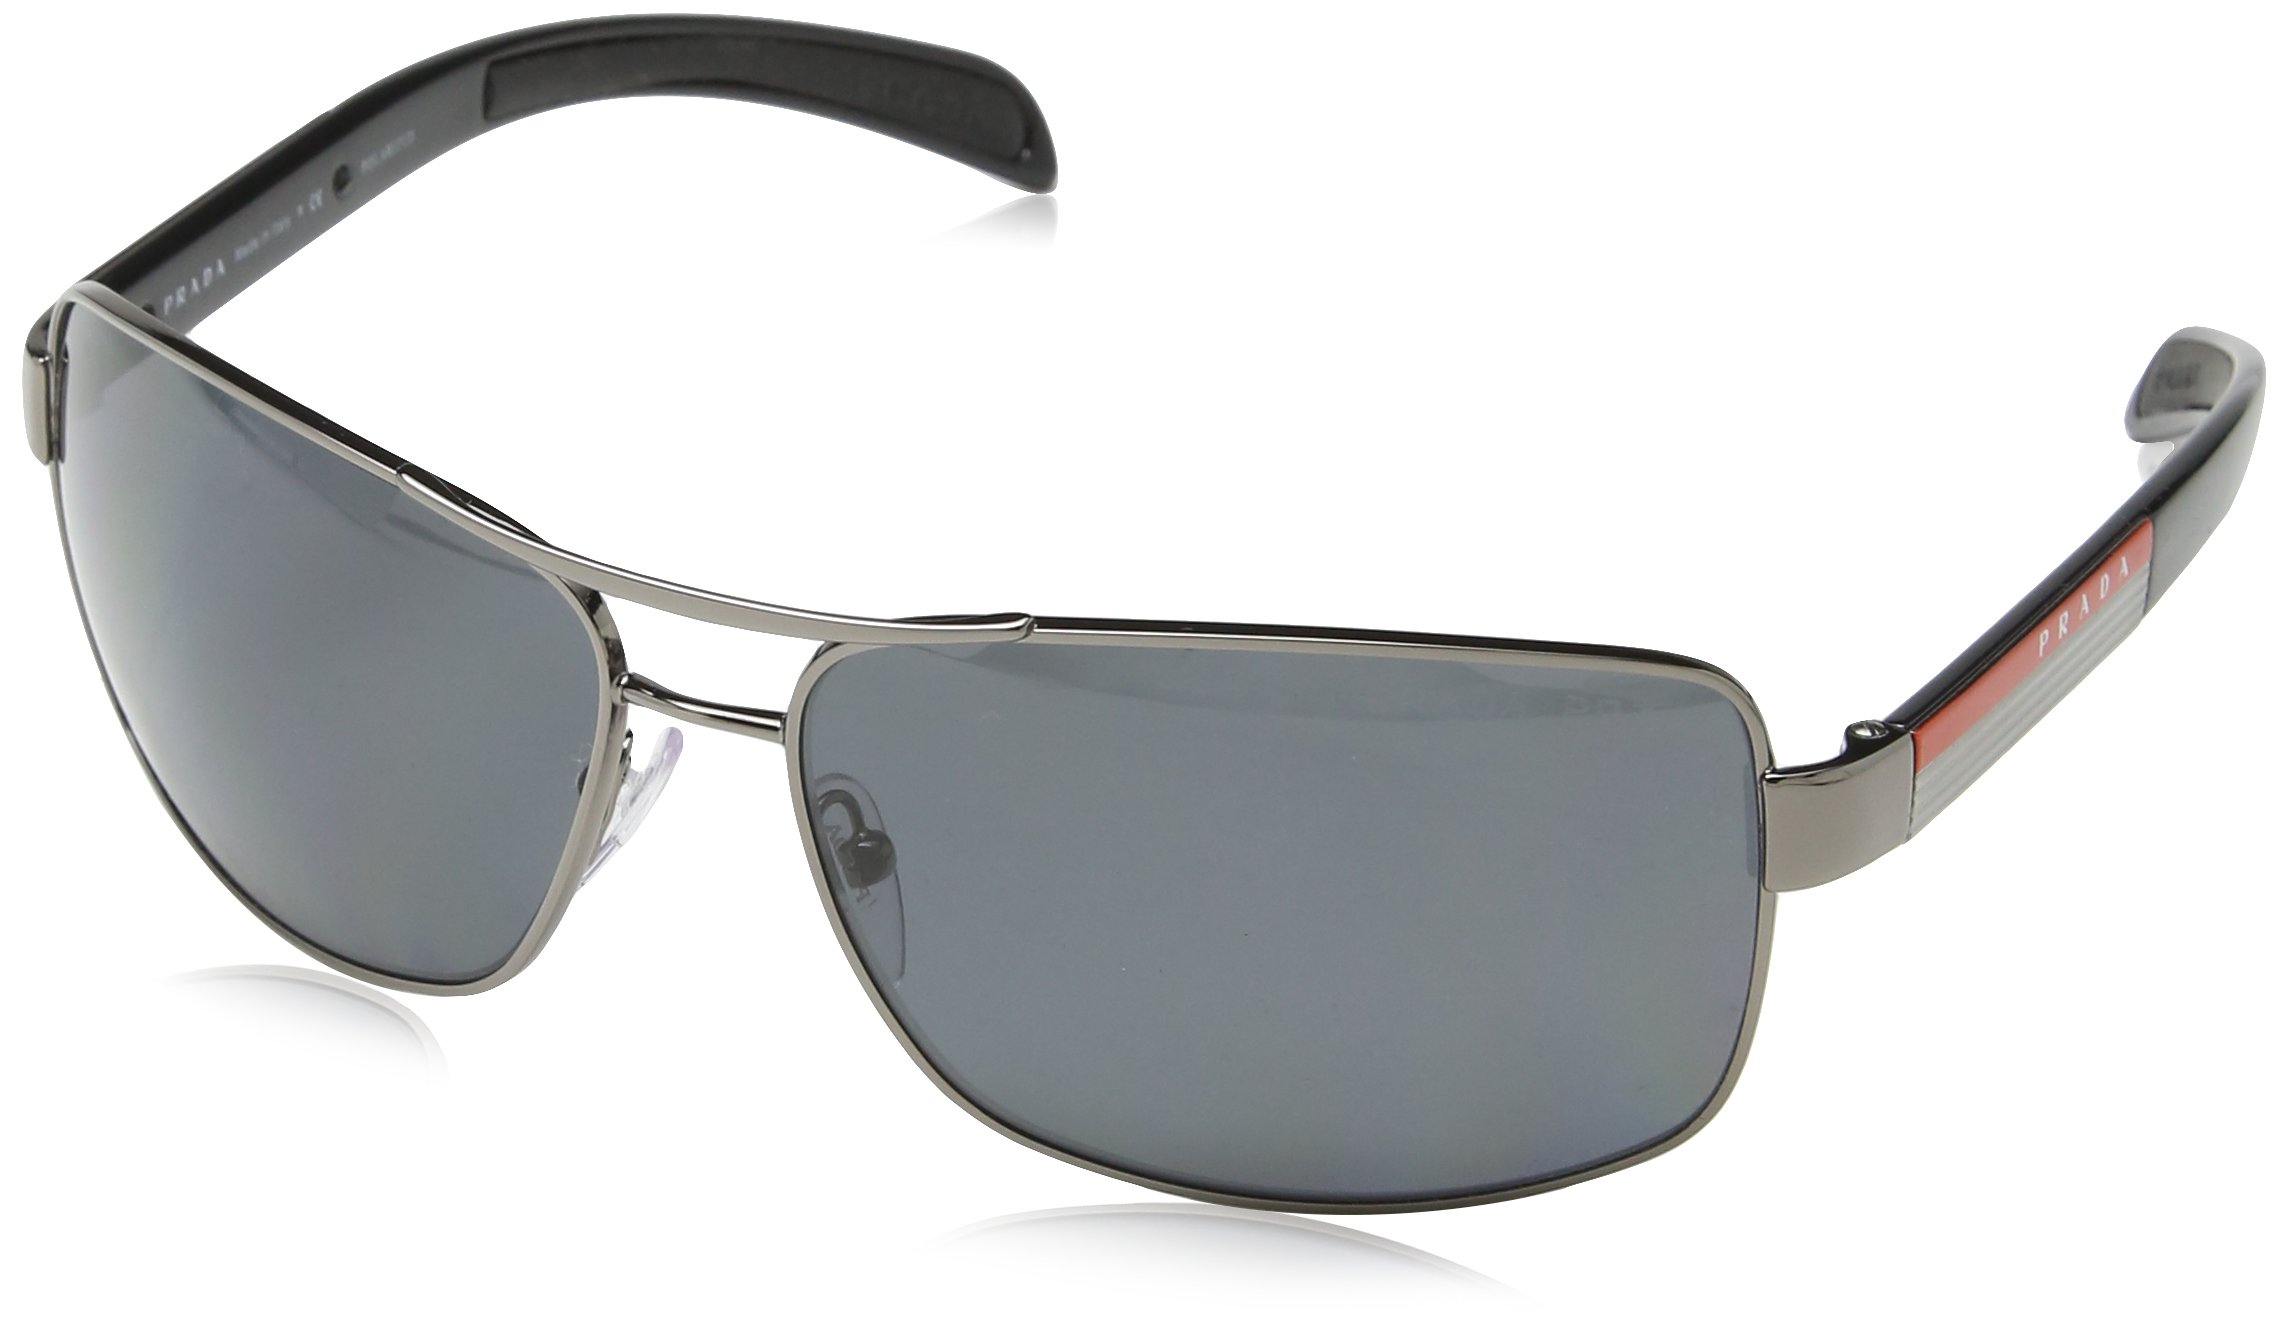 Prada Sport PS54IS Sunglasses-5AV/5Z1 Gunmetal (Polarized Gray Lens)-65mm by Prada